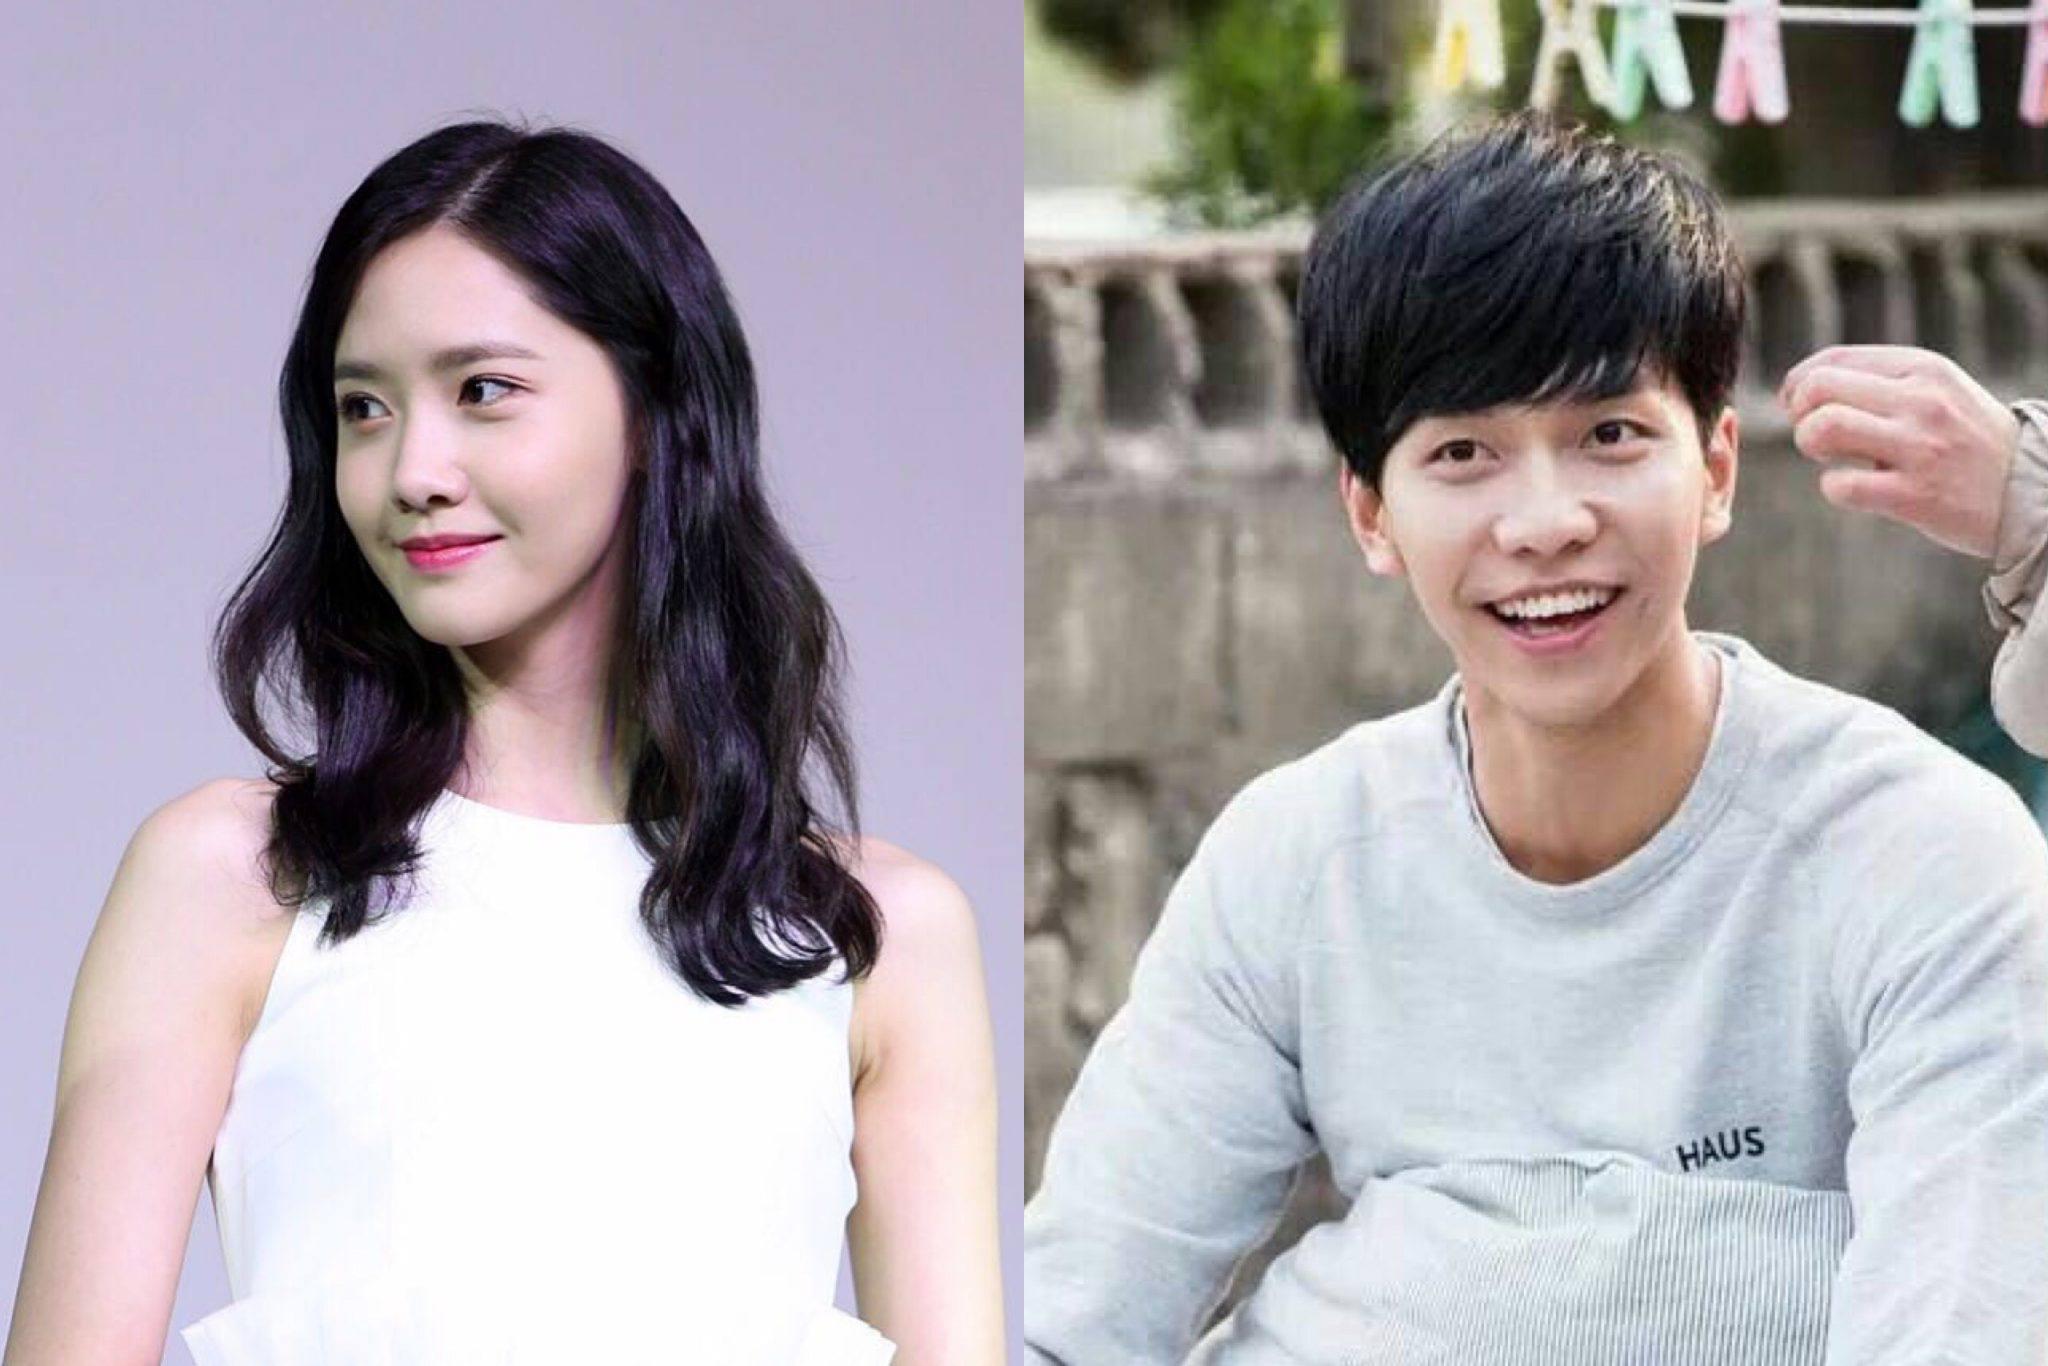 Yoona and lee seung gi still dating